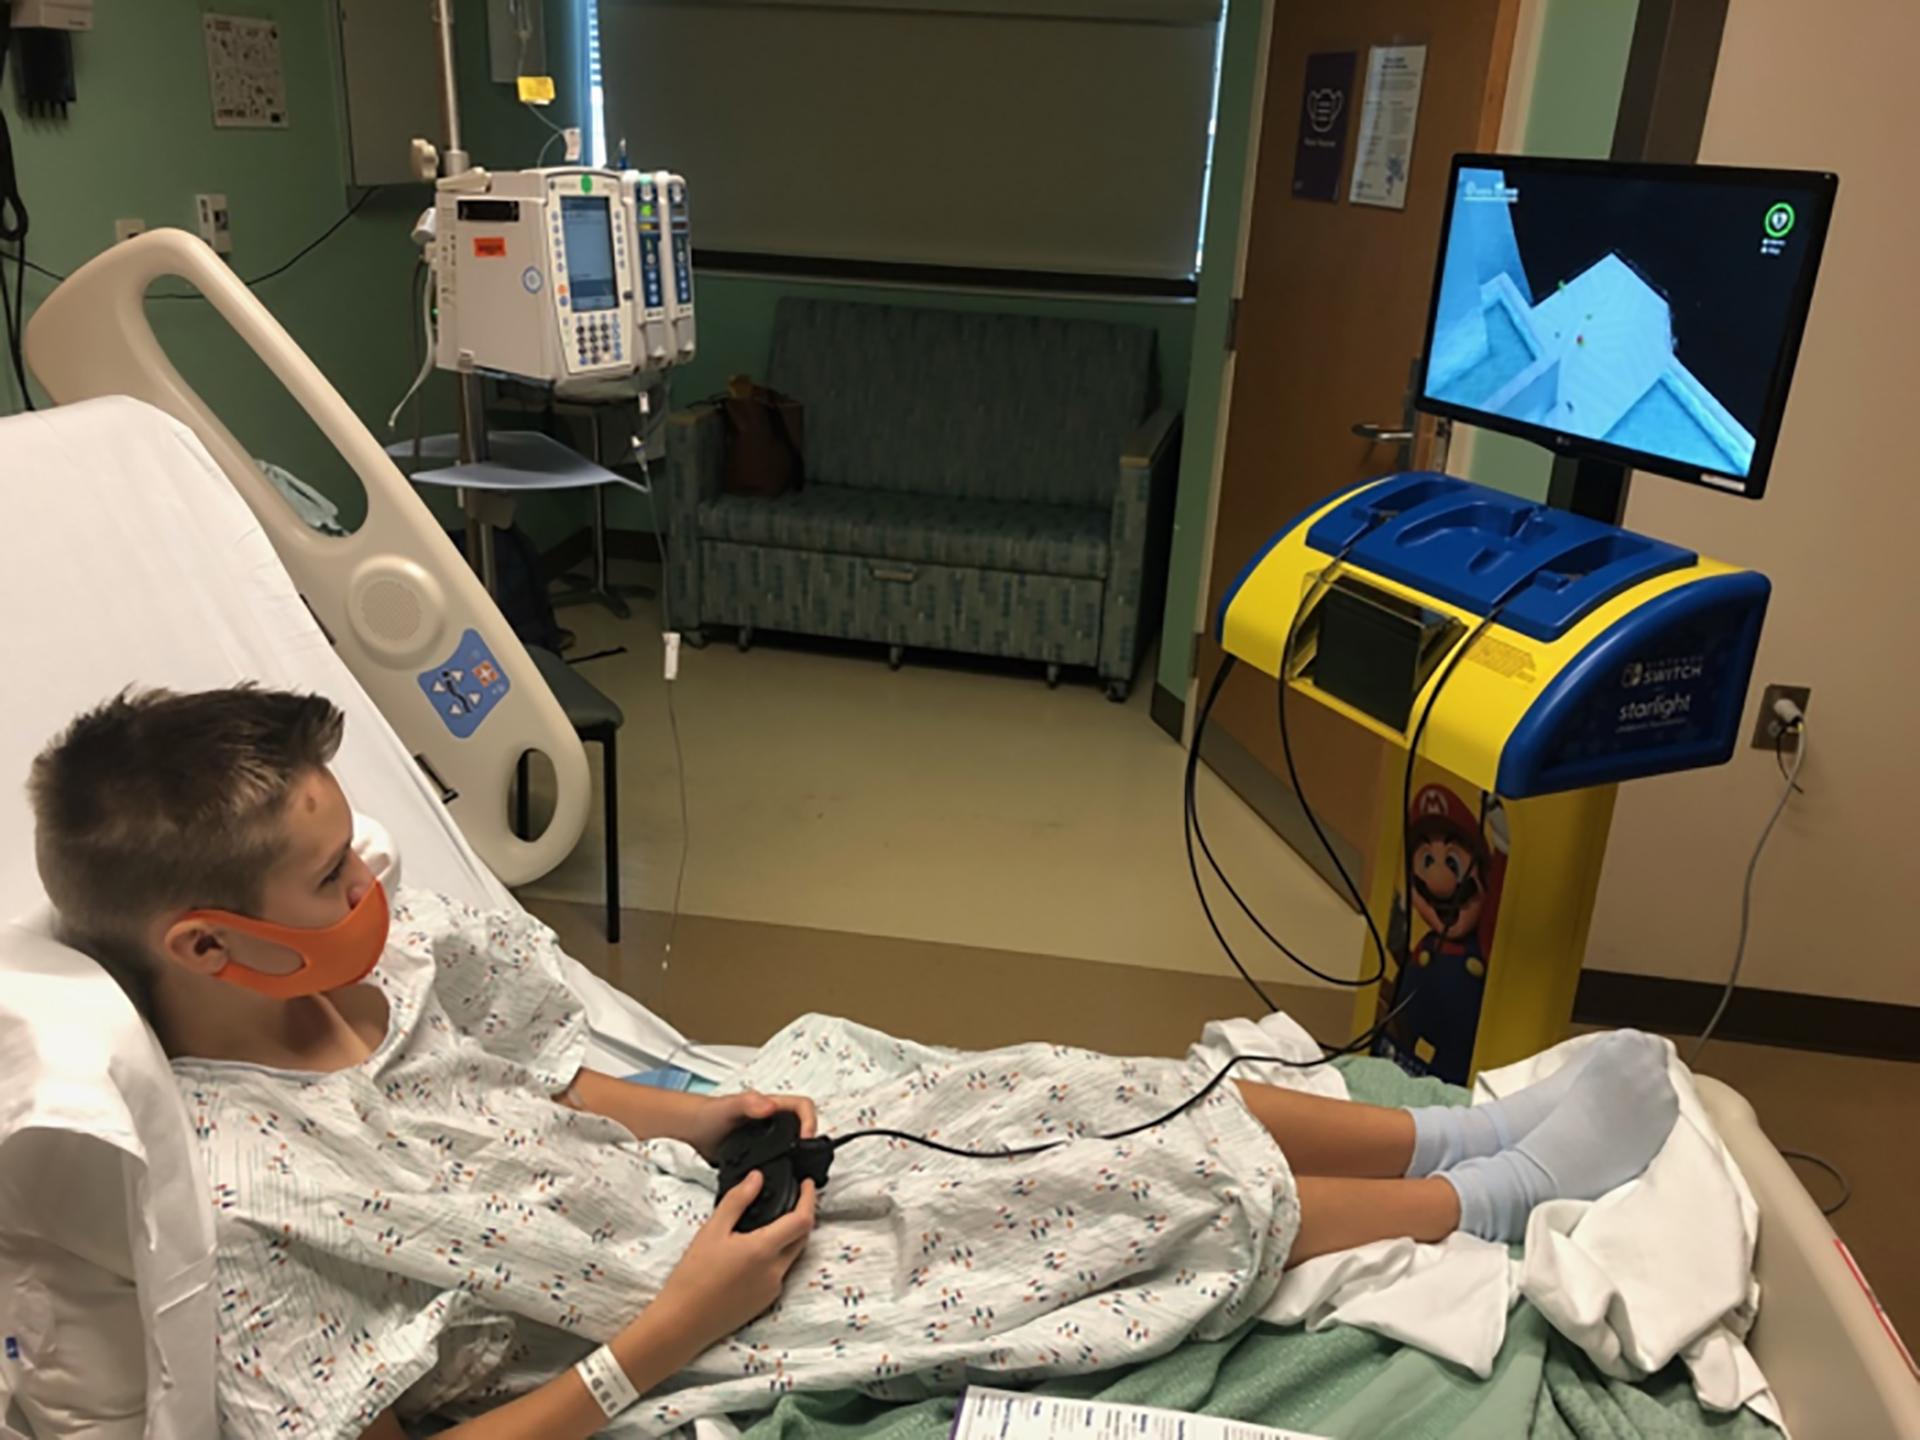 Nintendo spitale